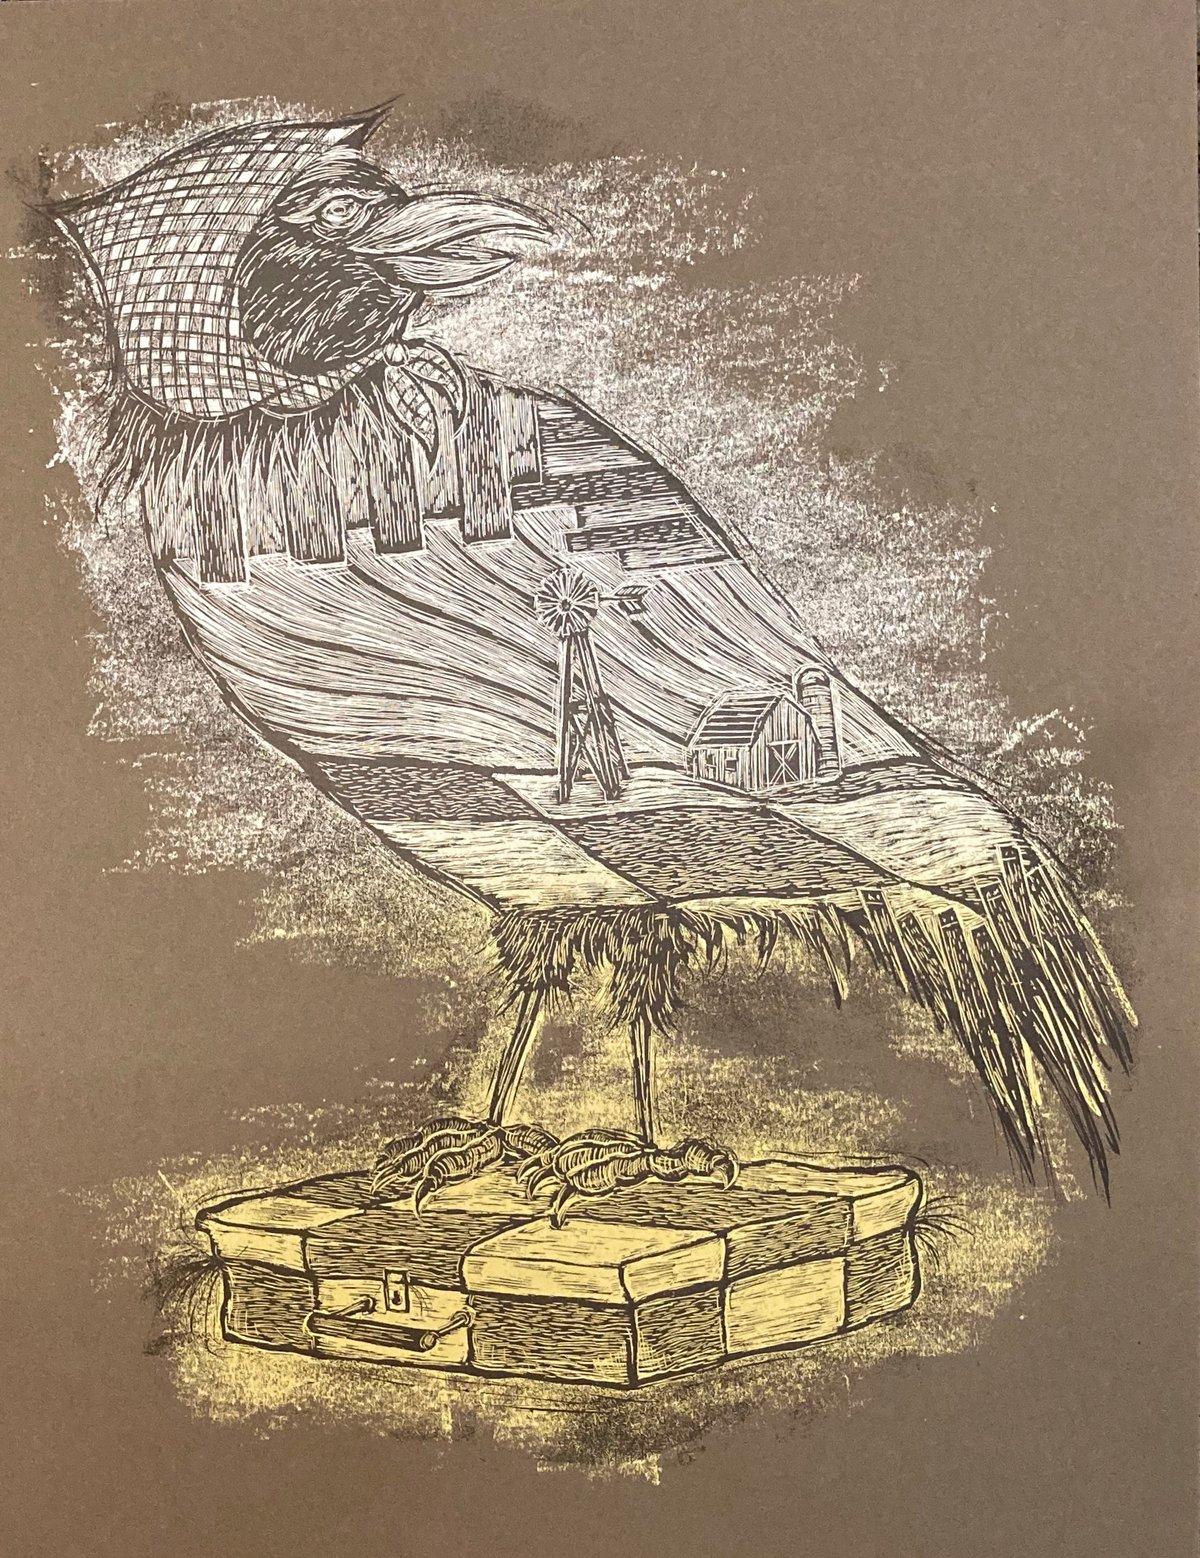 Rural Corvus